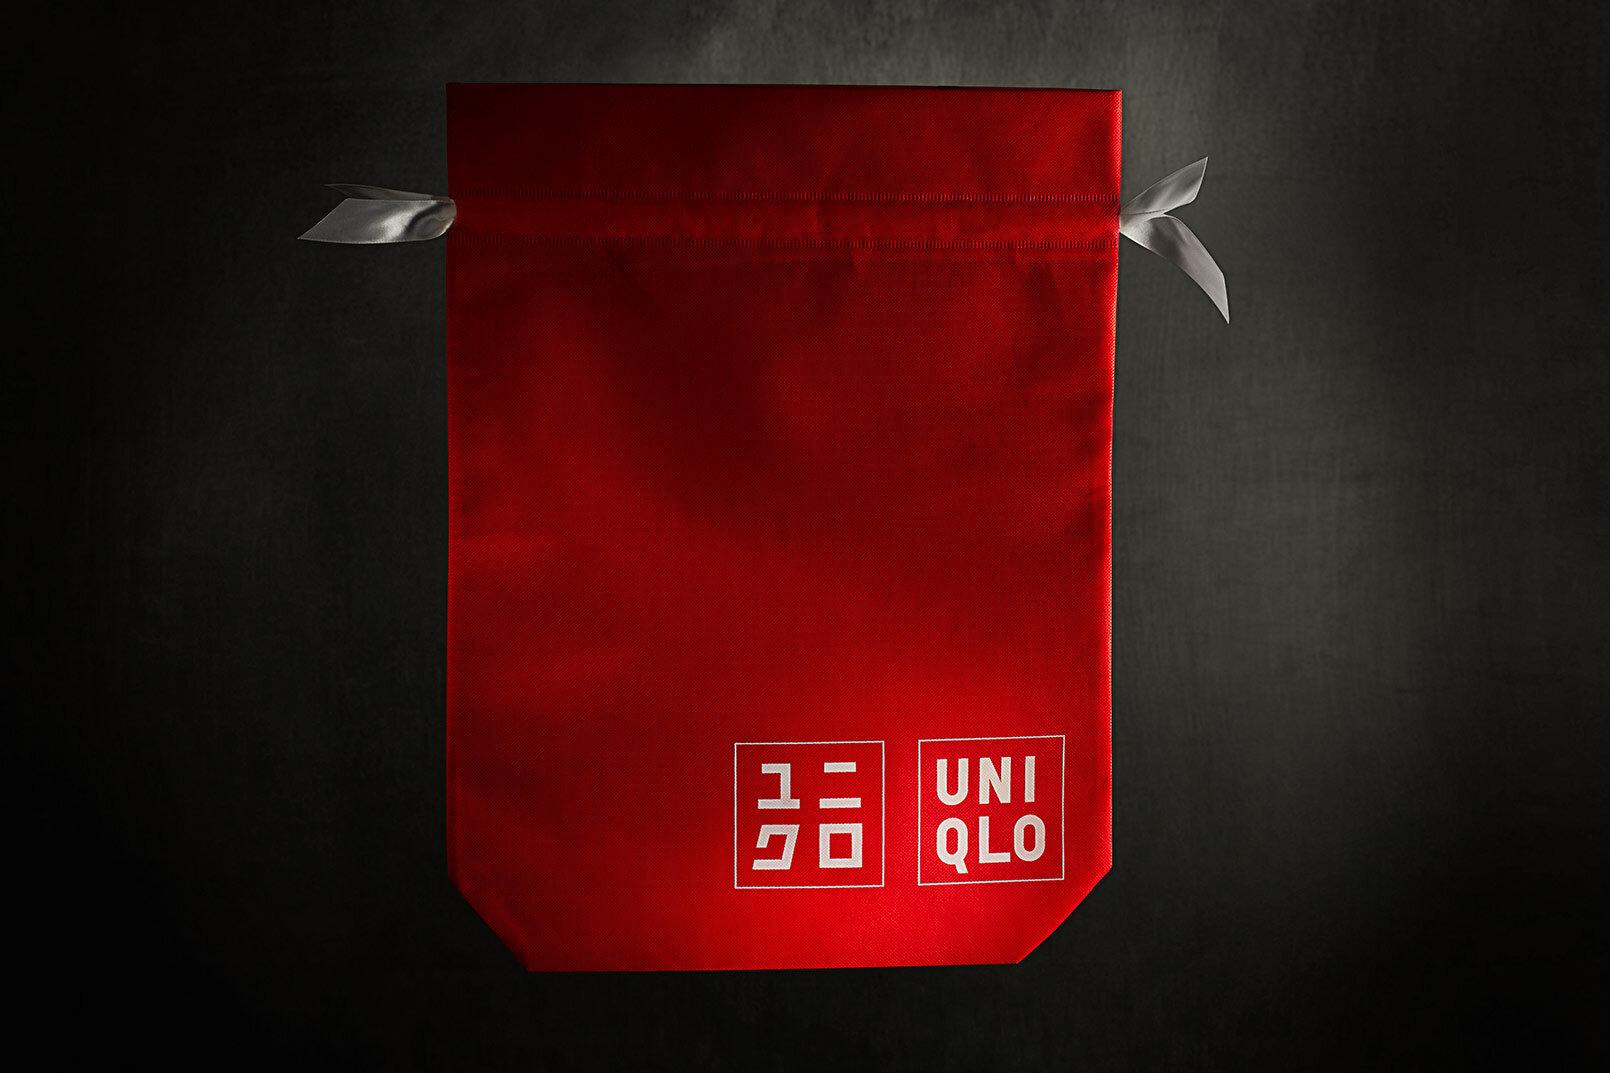 Uniqlo-Drawstring-Bag-Pouch-Ribbon-Silksckeen-结构包装 - 设计切割和缝合-1.jpg